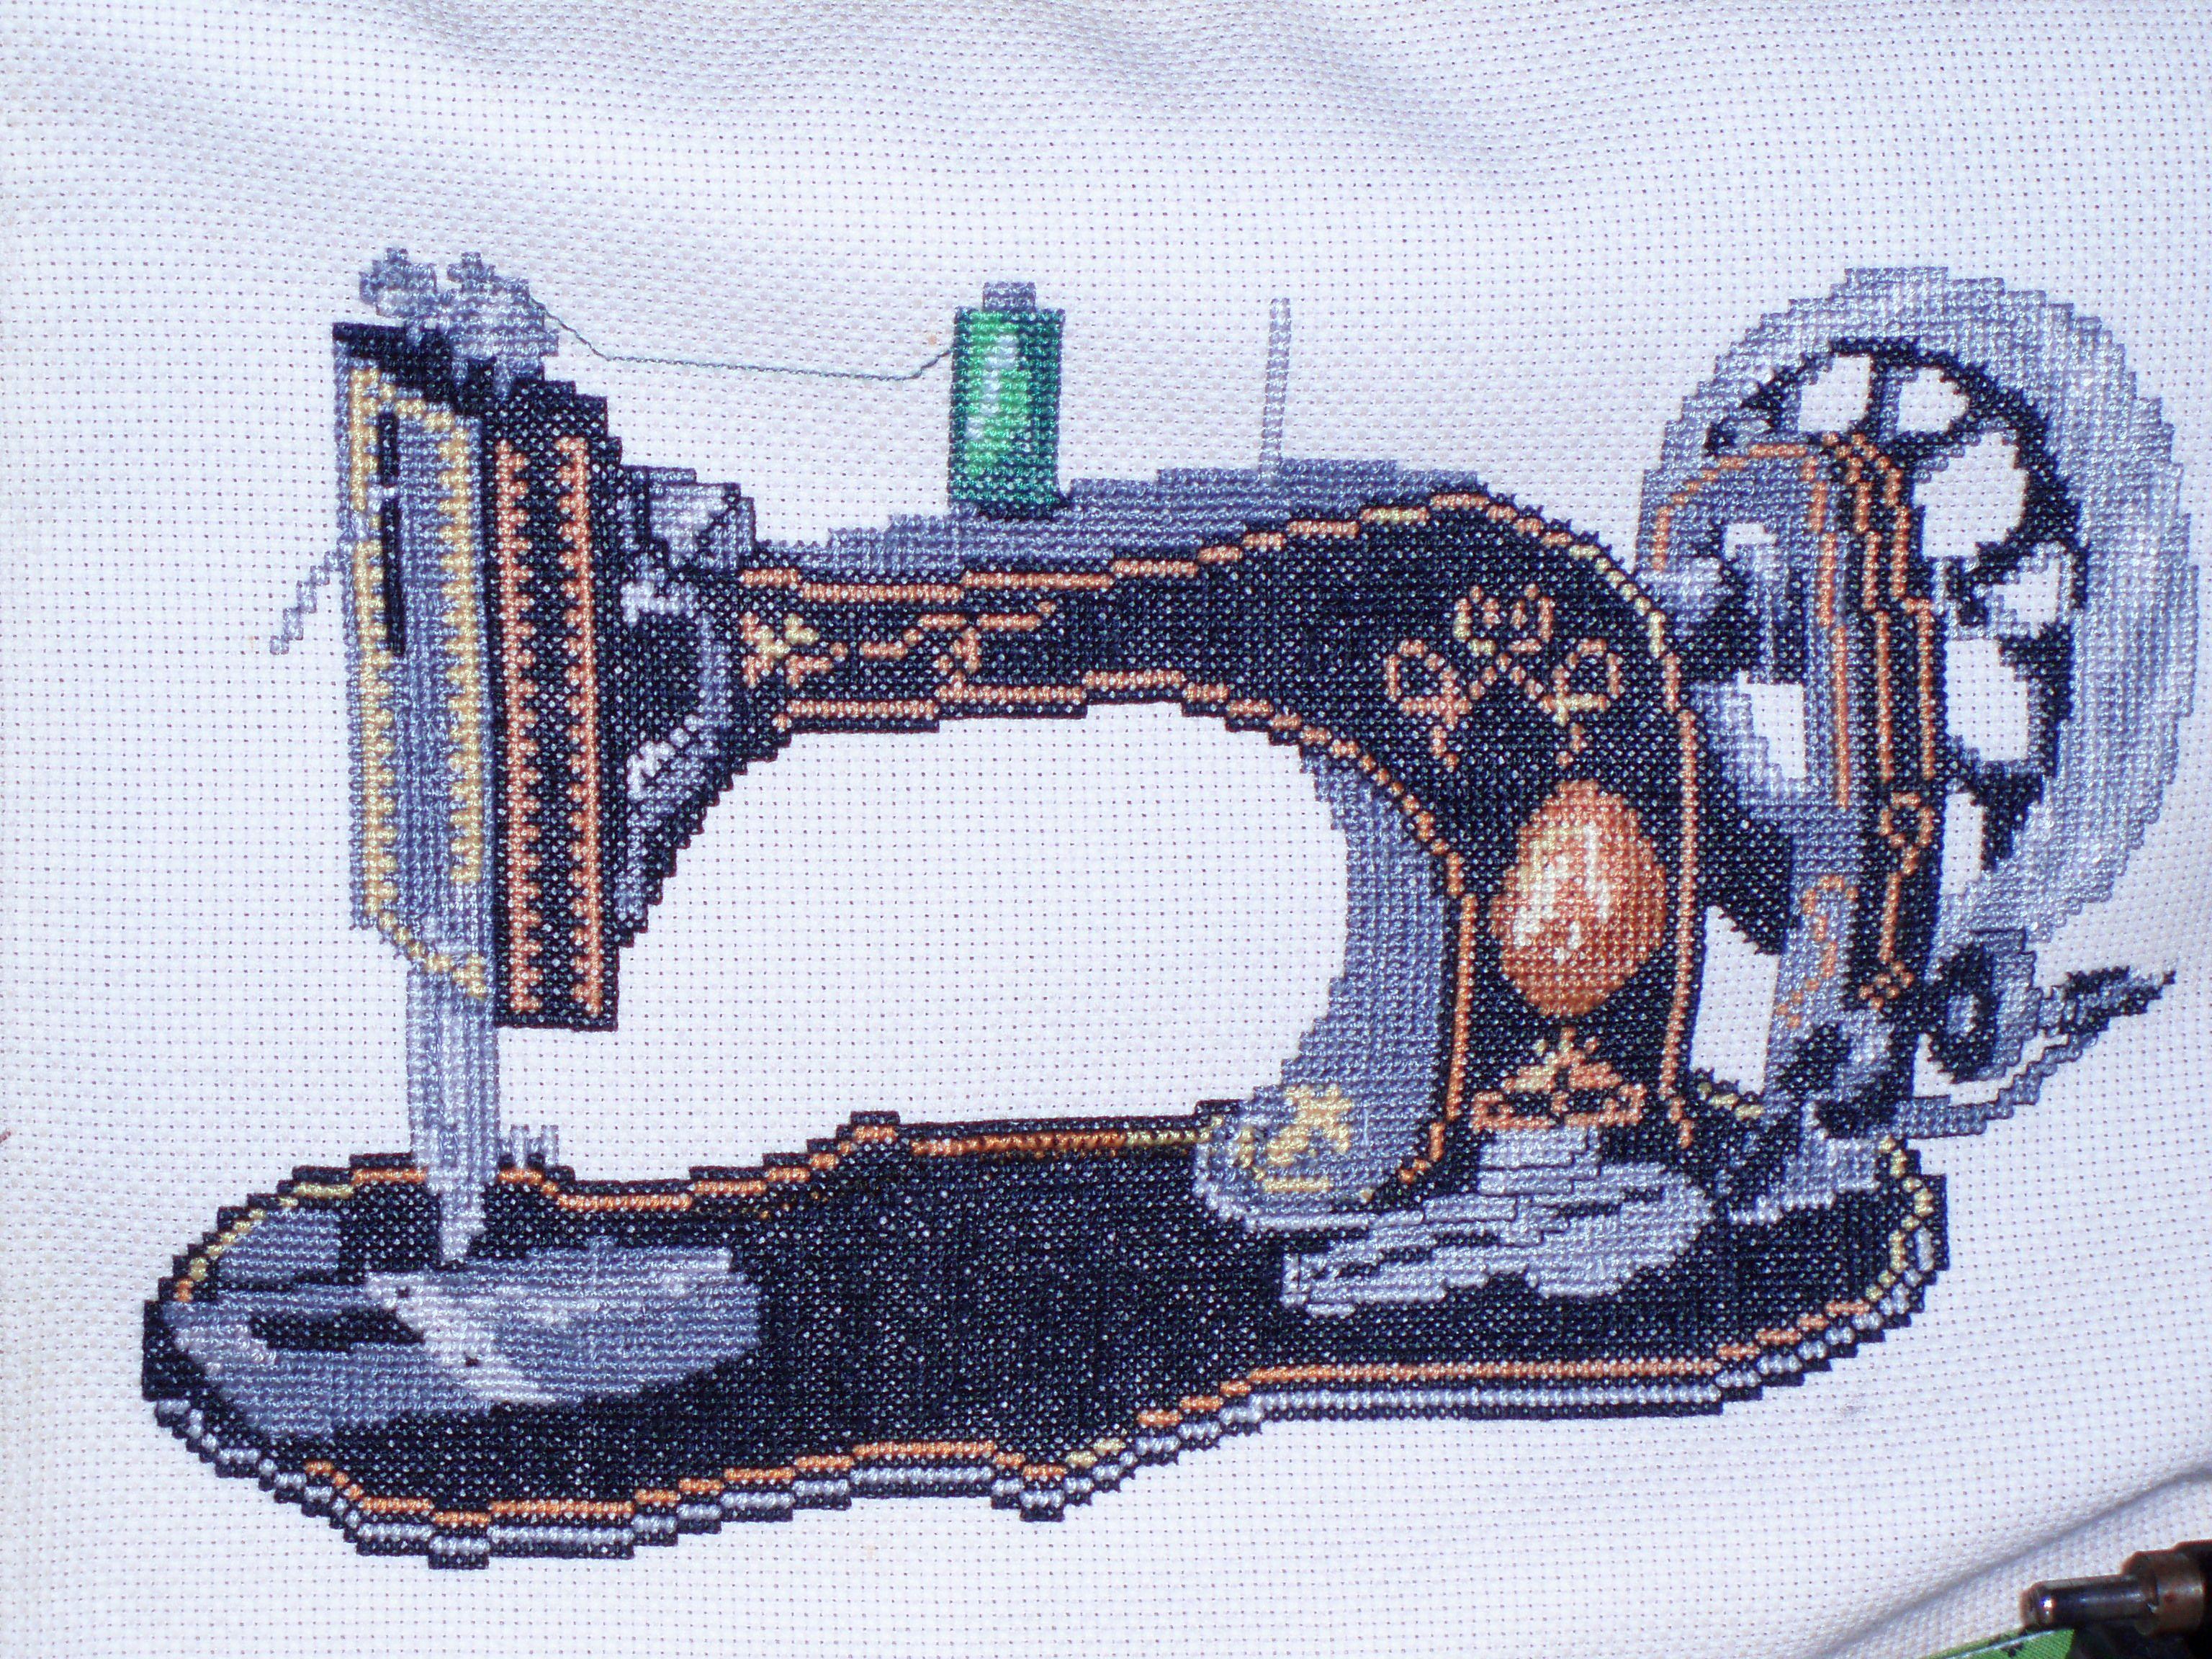 máquina de coser antigua en punto de cruz (With images